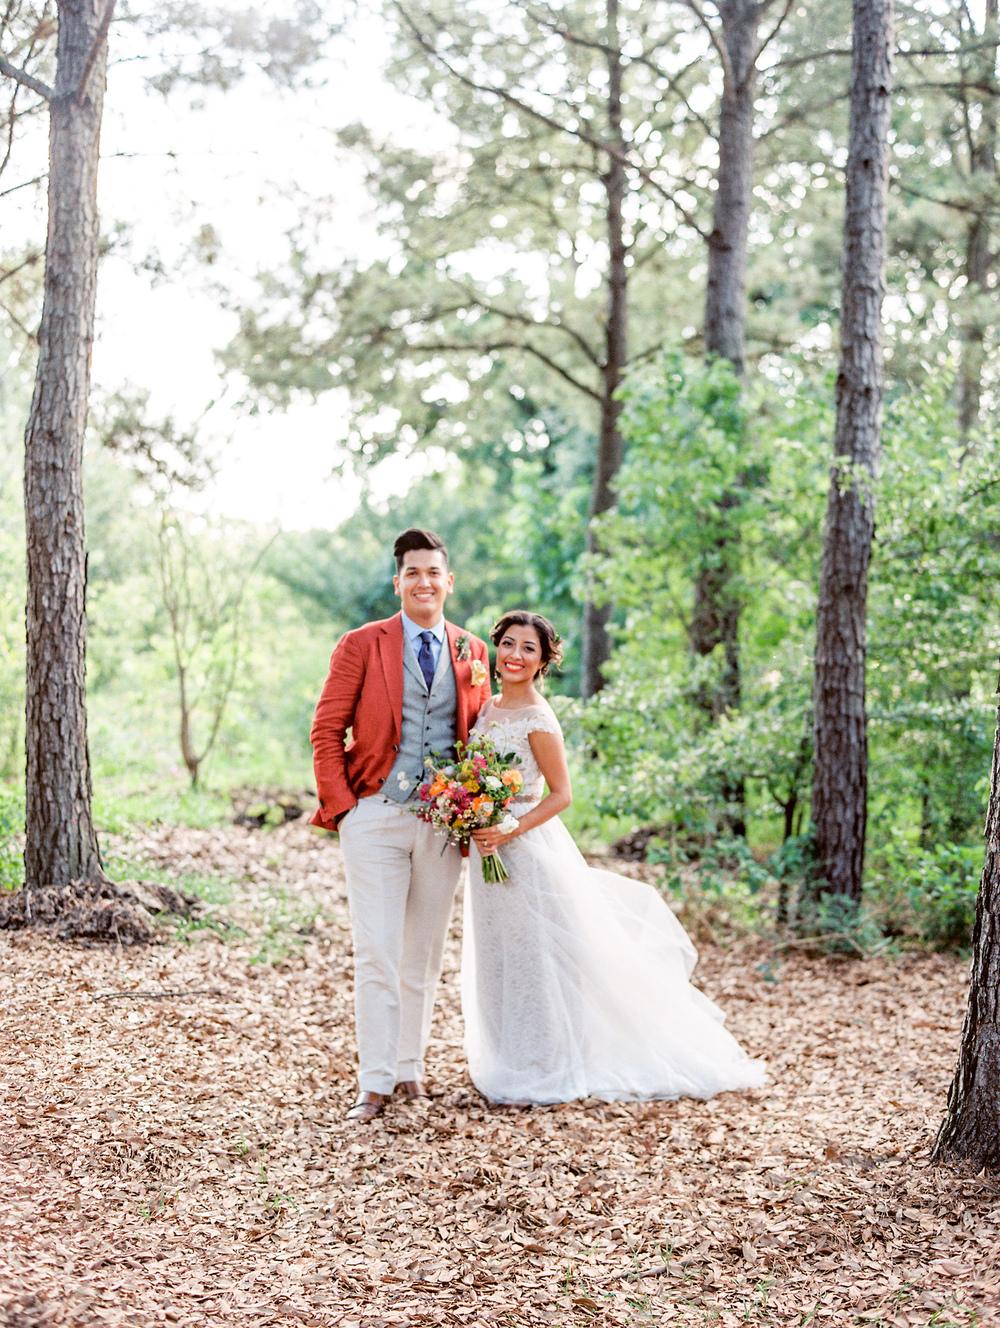 Dana-Fernandez-Photography-Martha-Stewart-Weddings-Houston-Texas-Wedding-Photographer-Film-18.jpg